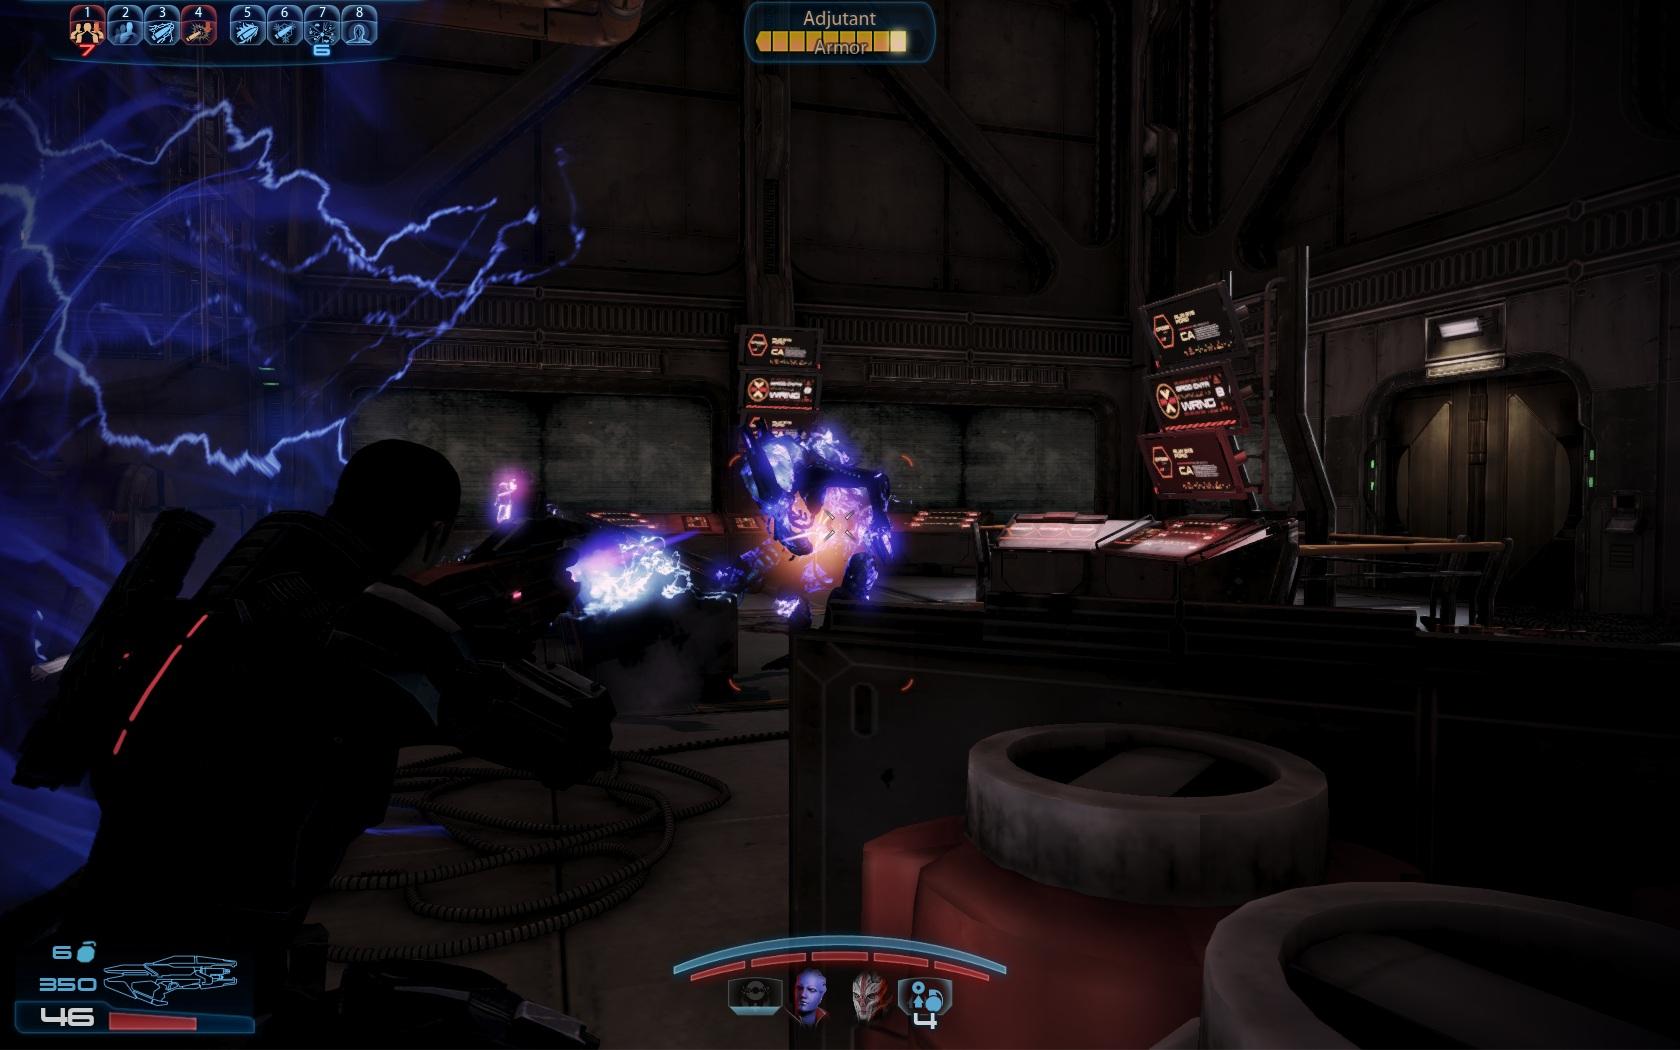 Mass Effect 3: Omega - Temná strana galaxie 72699